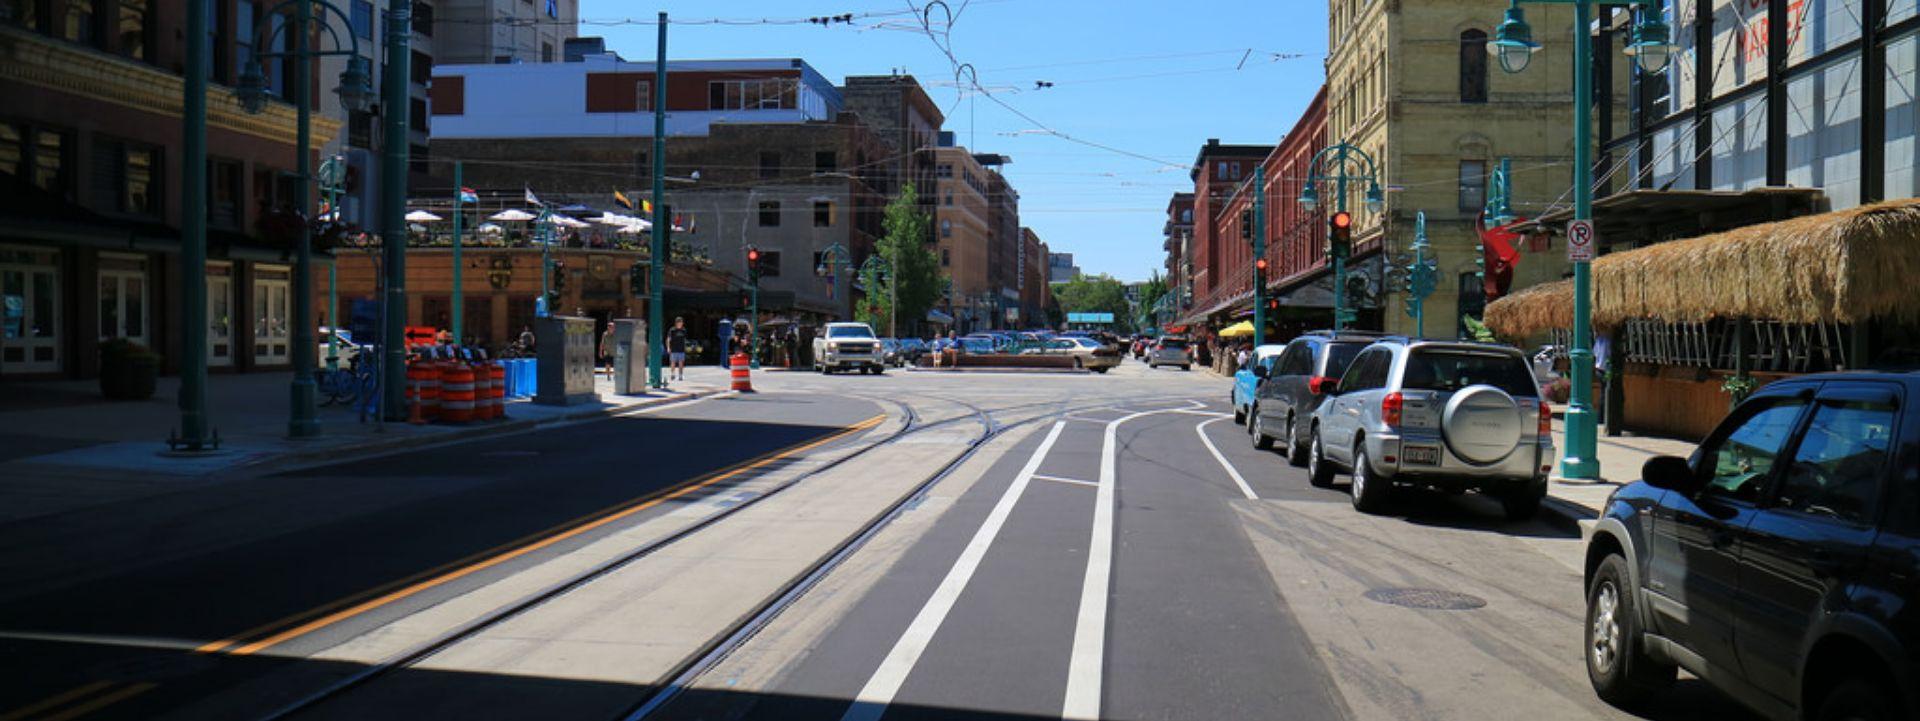 Cars parked near a streetcar's tracks